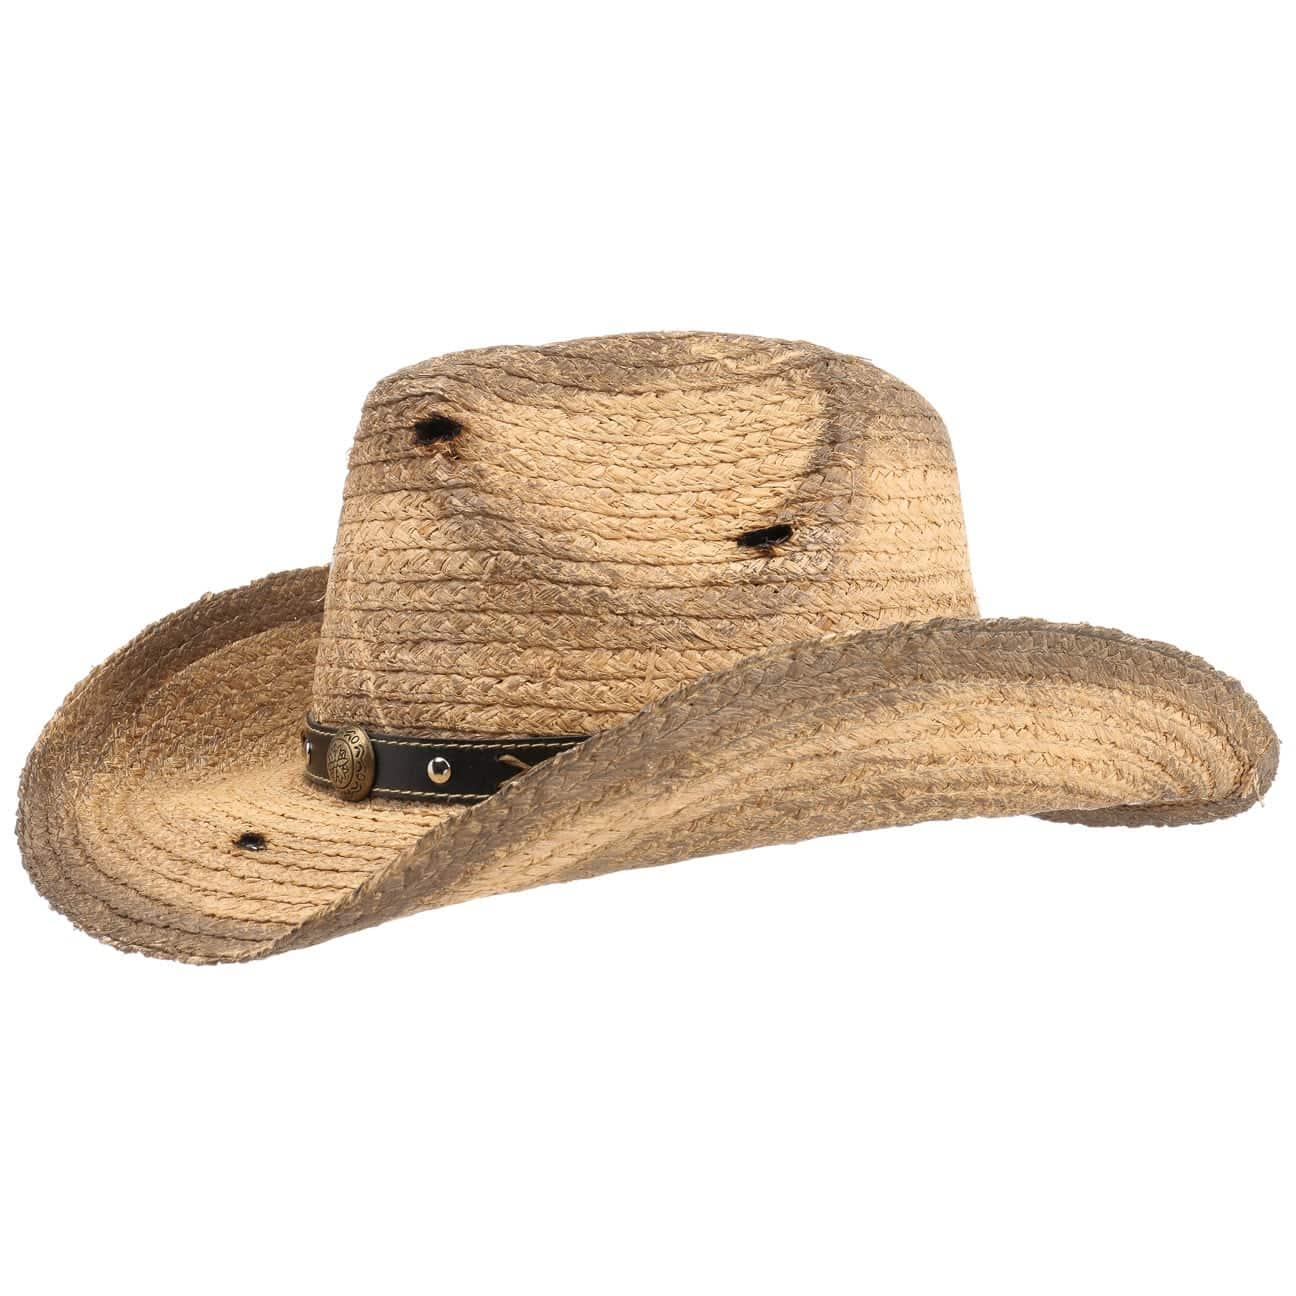 Sombrero Paja Gunsmoke Western by Conner  sombrero de verano